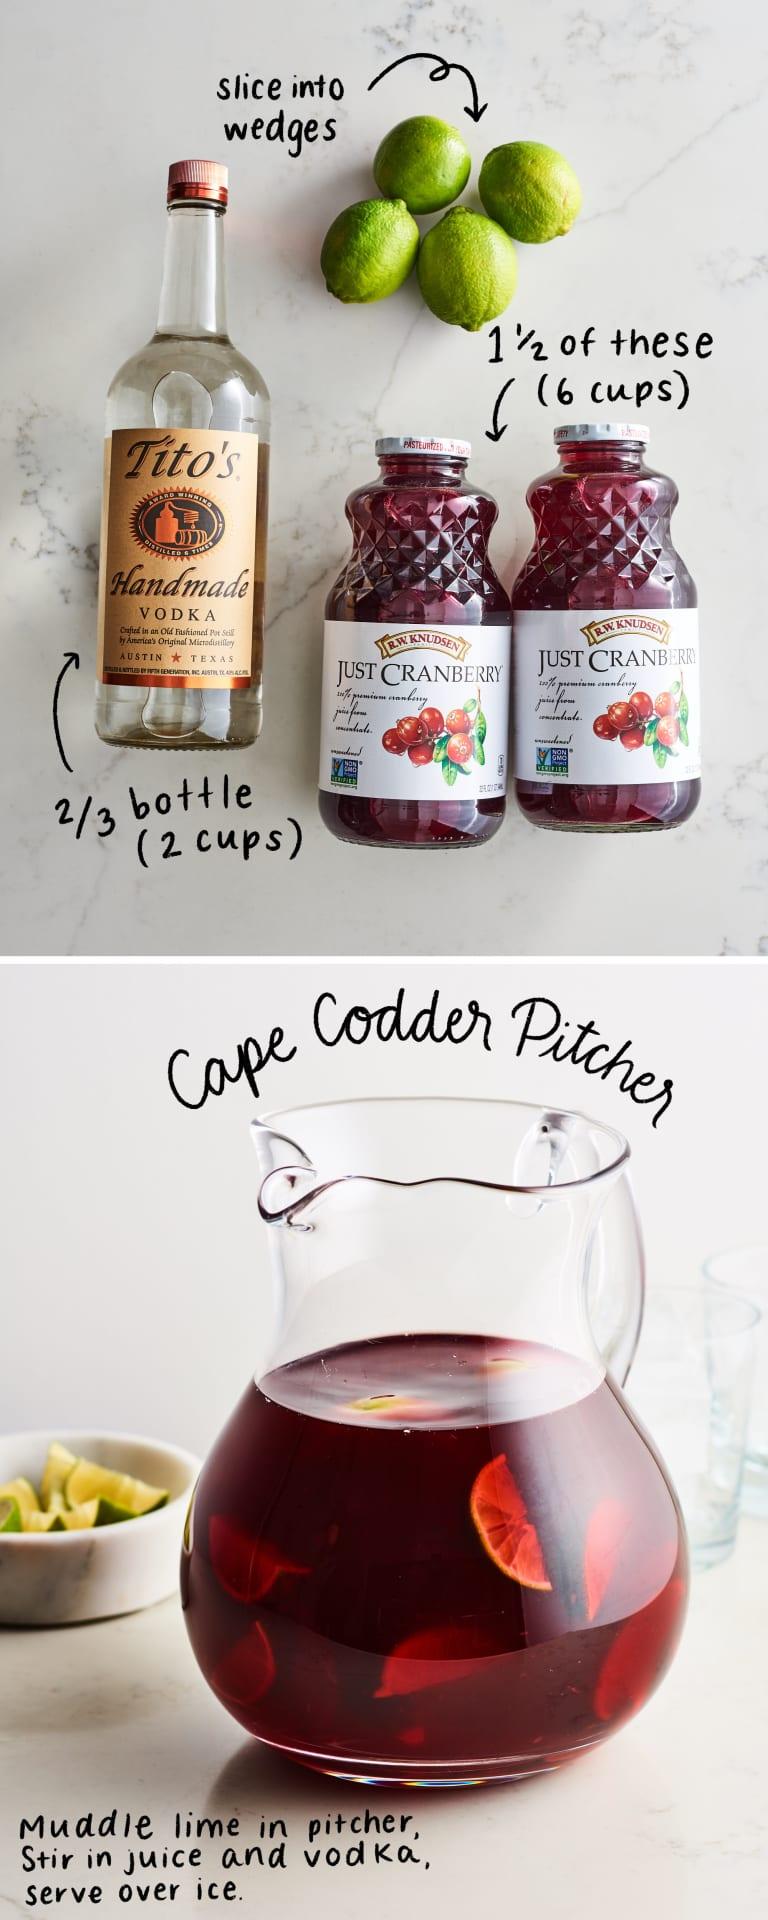 3 Ingredient Vodka Pitcher Cocktails To Serve A Crowd Kitchn